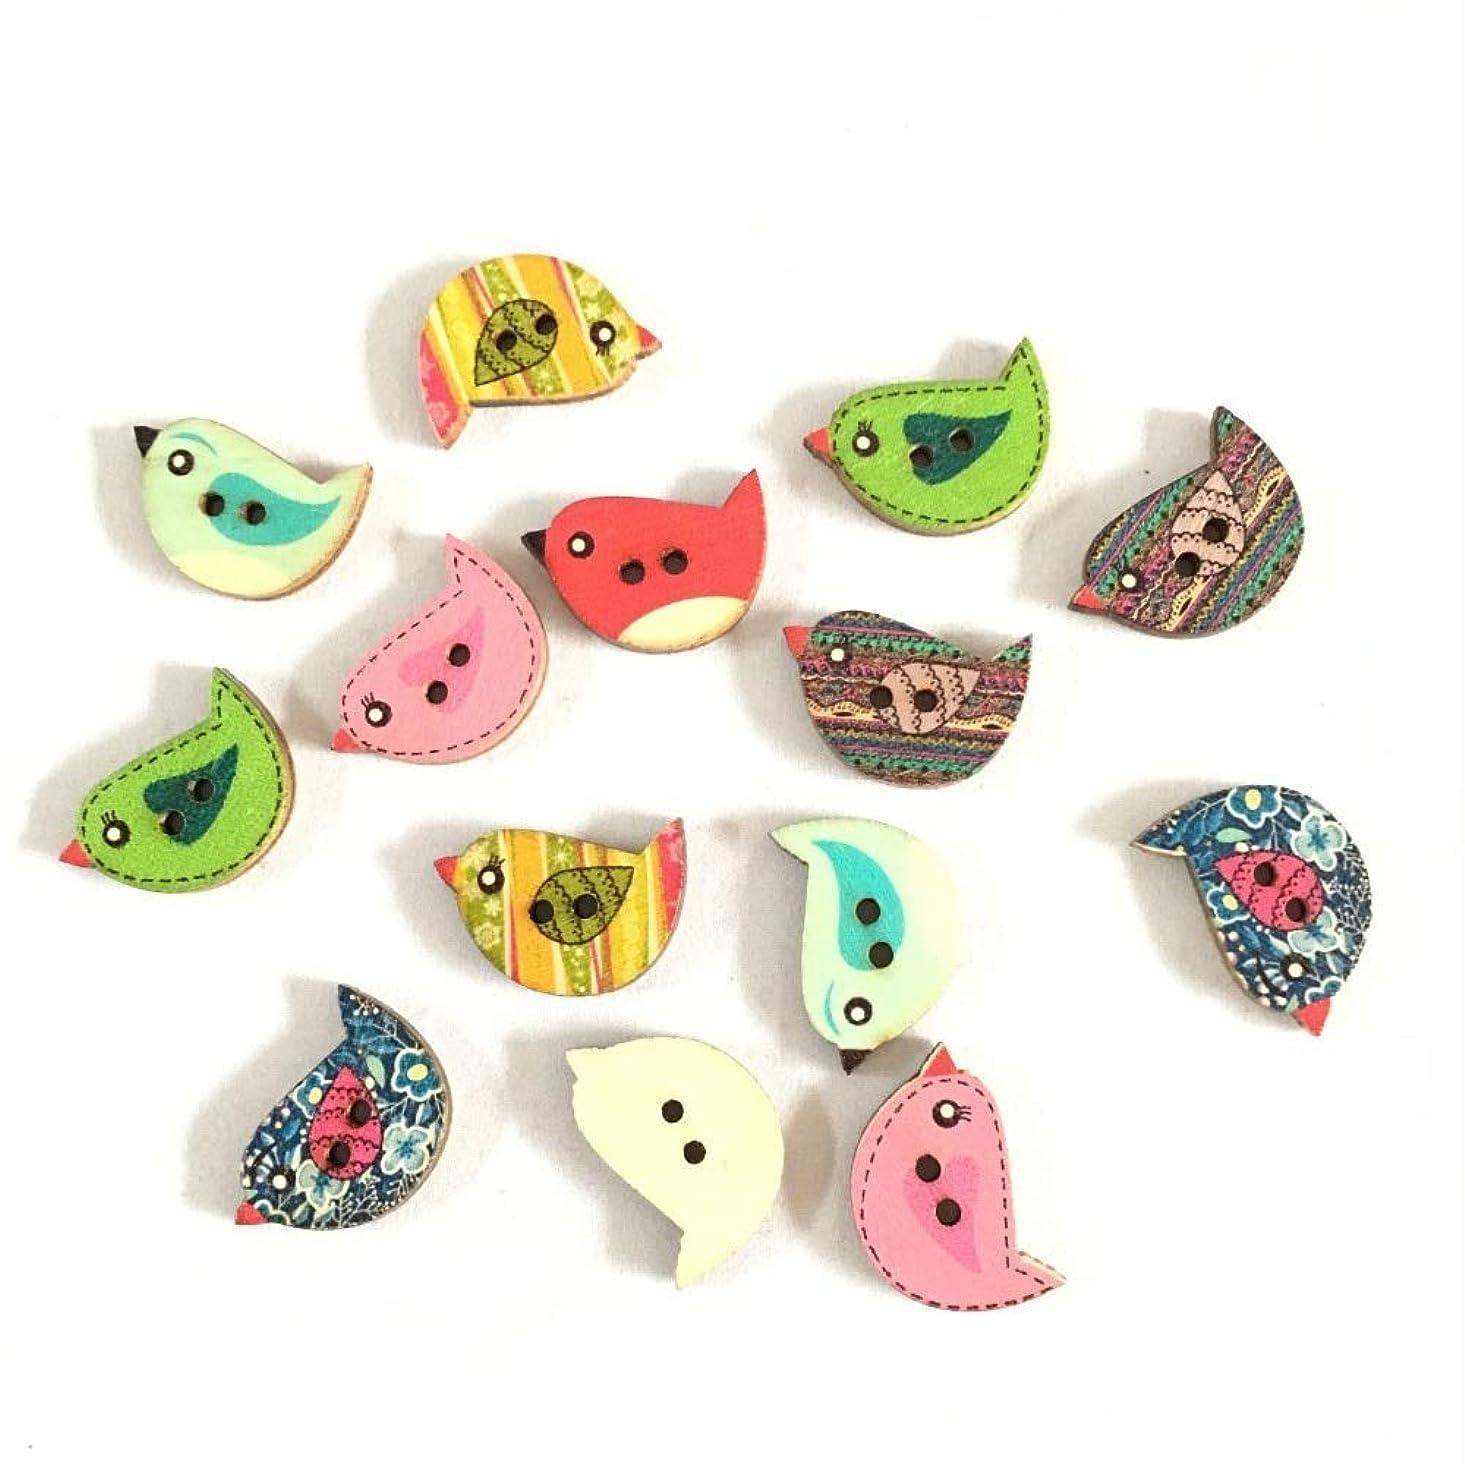 Jicorzo - 50pcsのミックス木製ボタンのかわいい鳥のパターンDecoratiラウンド2つの穴木製縫製するためのボタン、DIY、衣料品アクセサリー